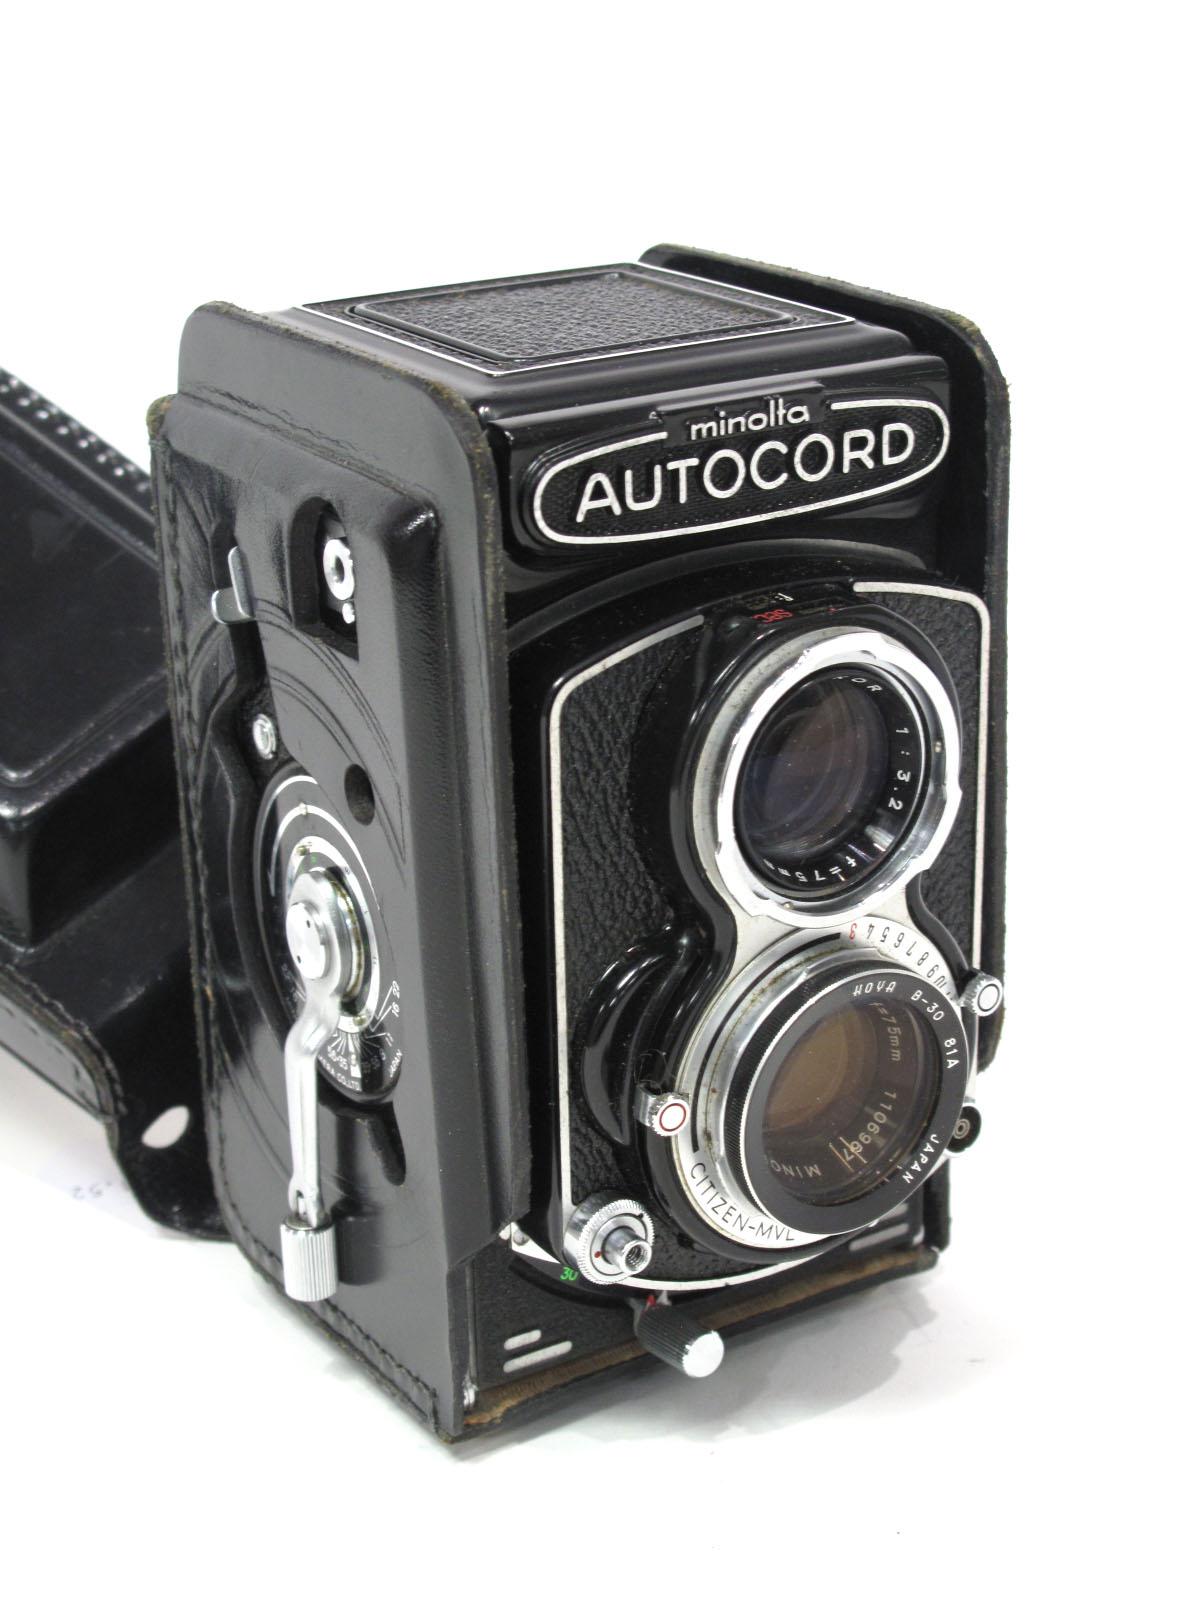 Minolta Autocord, Rokkor f=75mm lens in black leather case.